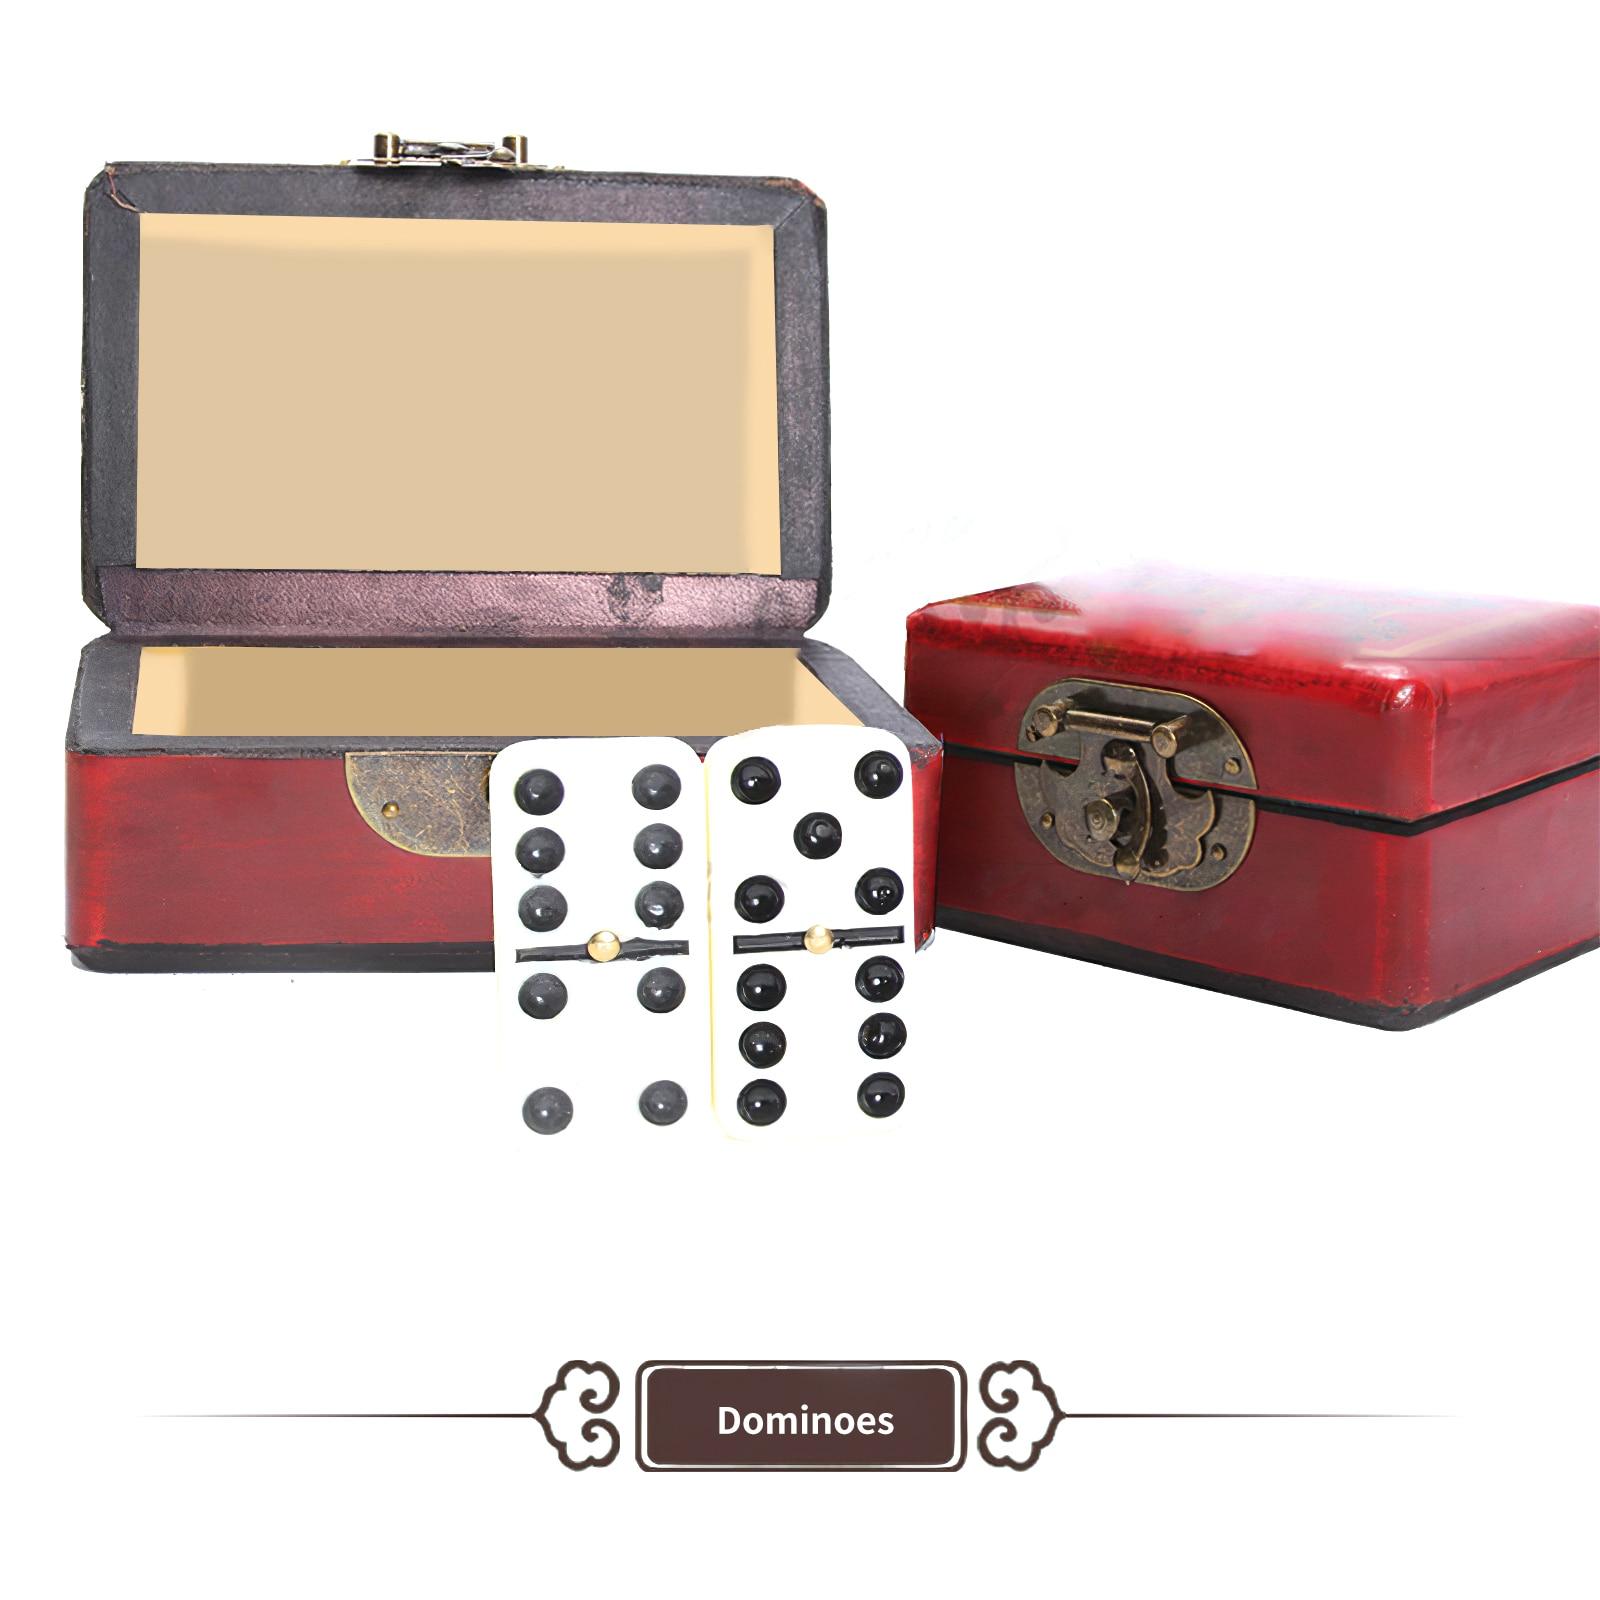 Educational Portable Antique Domino Box Handmade Retro Dominoes Game Sets Portable Classic Playability Domino Chess Board Game